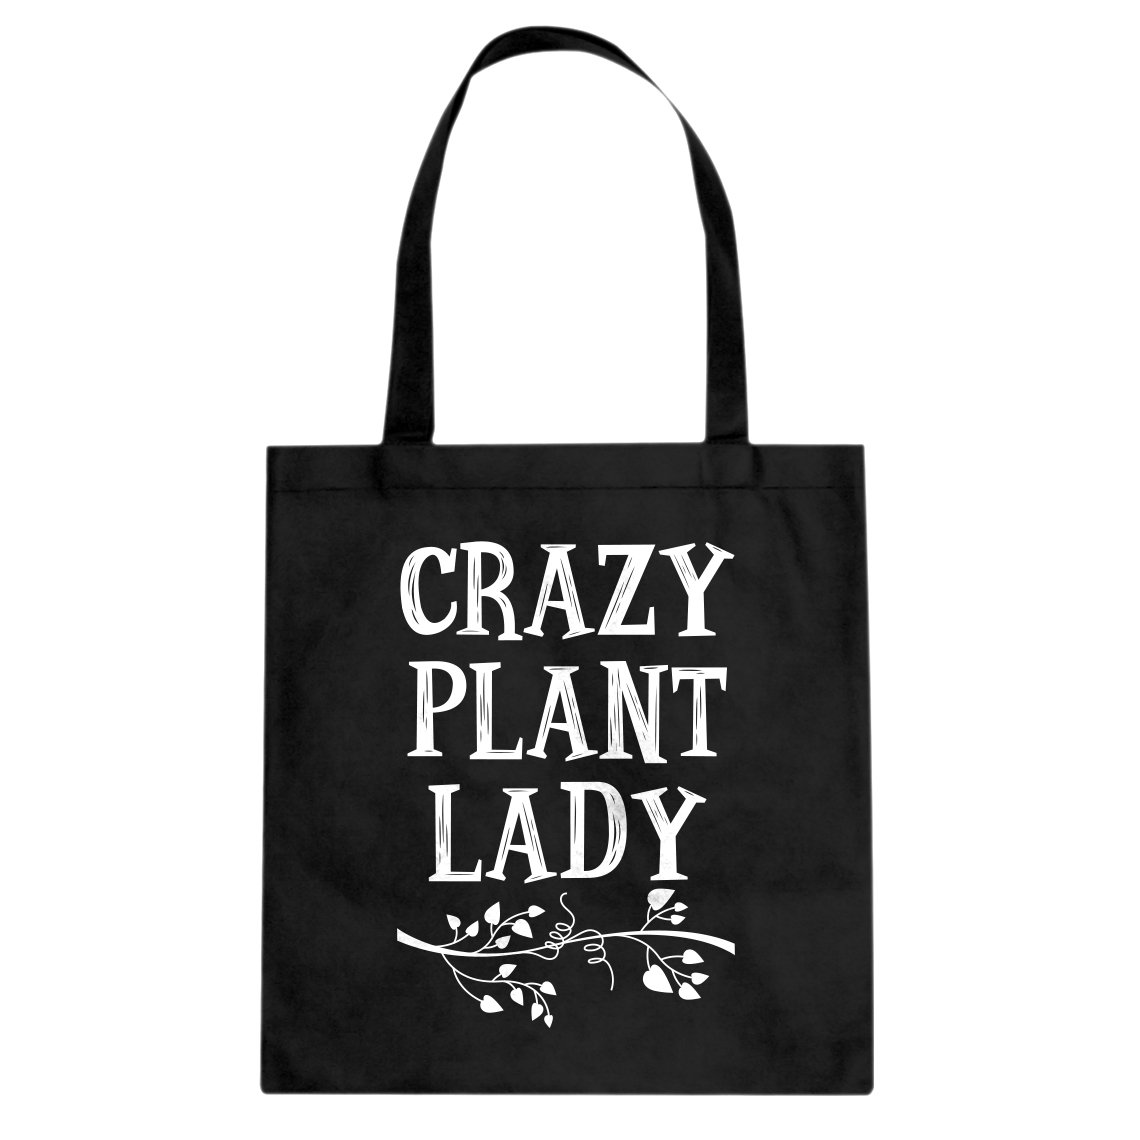 Indica Plateau Crazy Plant Ladyキャンバストートバッグ L ブラック 3270-B-BK-L B06Y8TFSPC  ブラック L